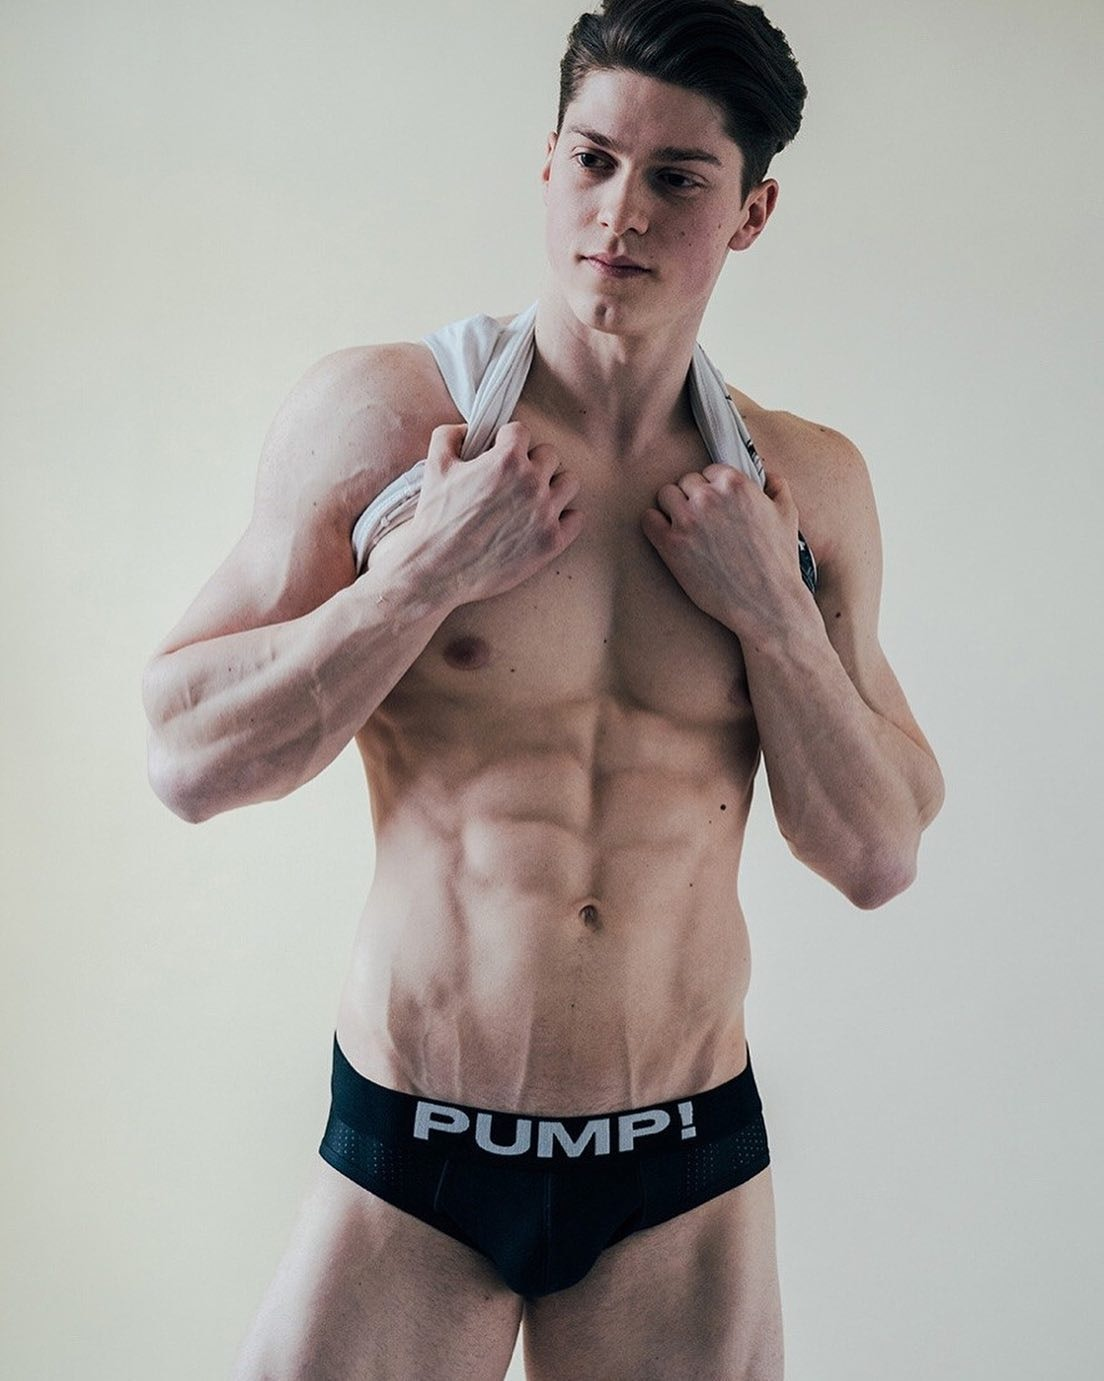 #men #pumpunderwear #briefs #abs #muscle #bulge #hotmen #hotboys